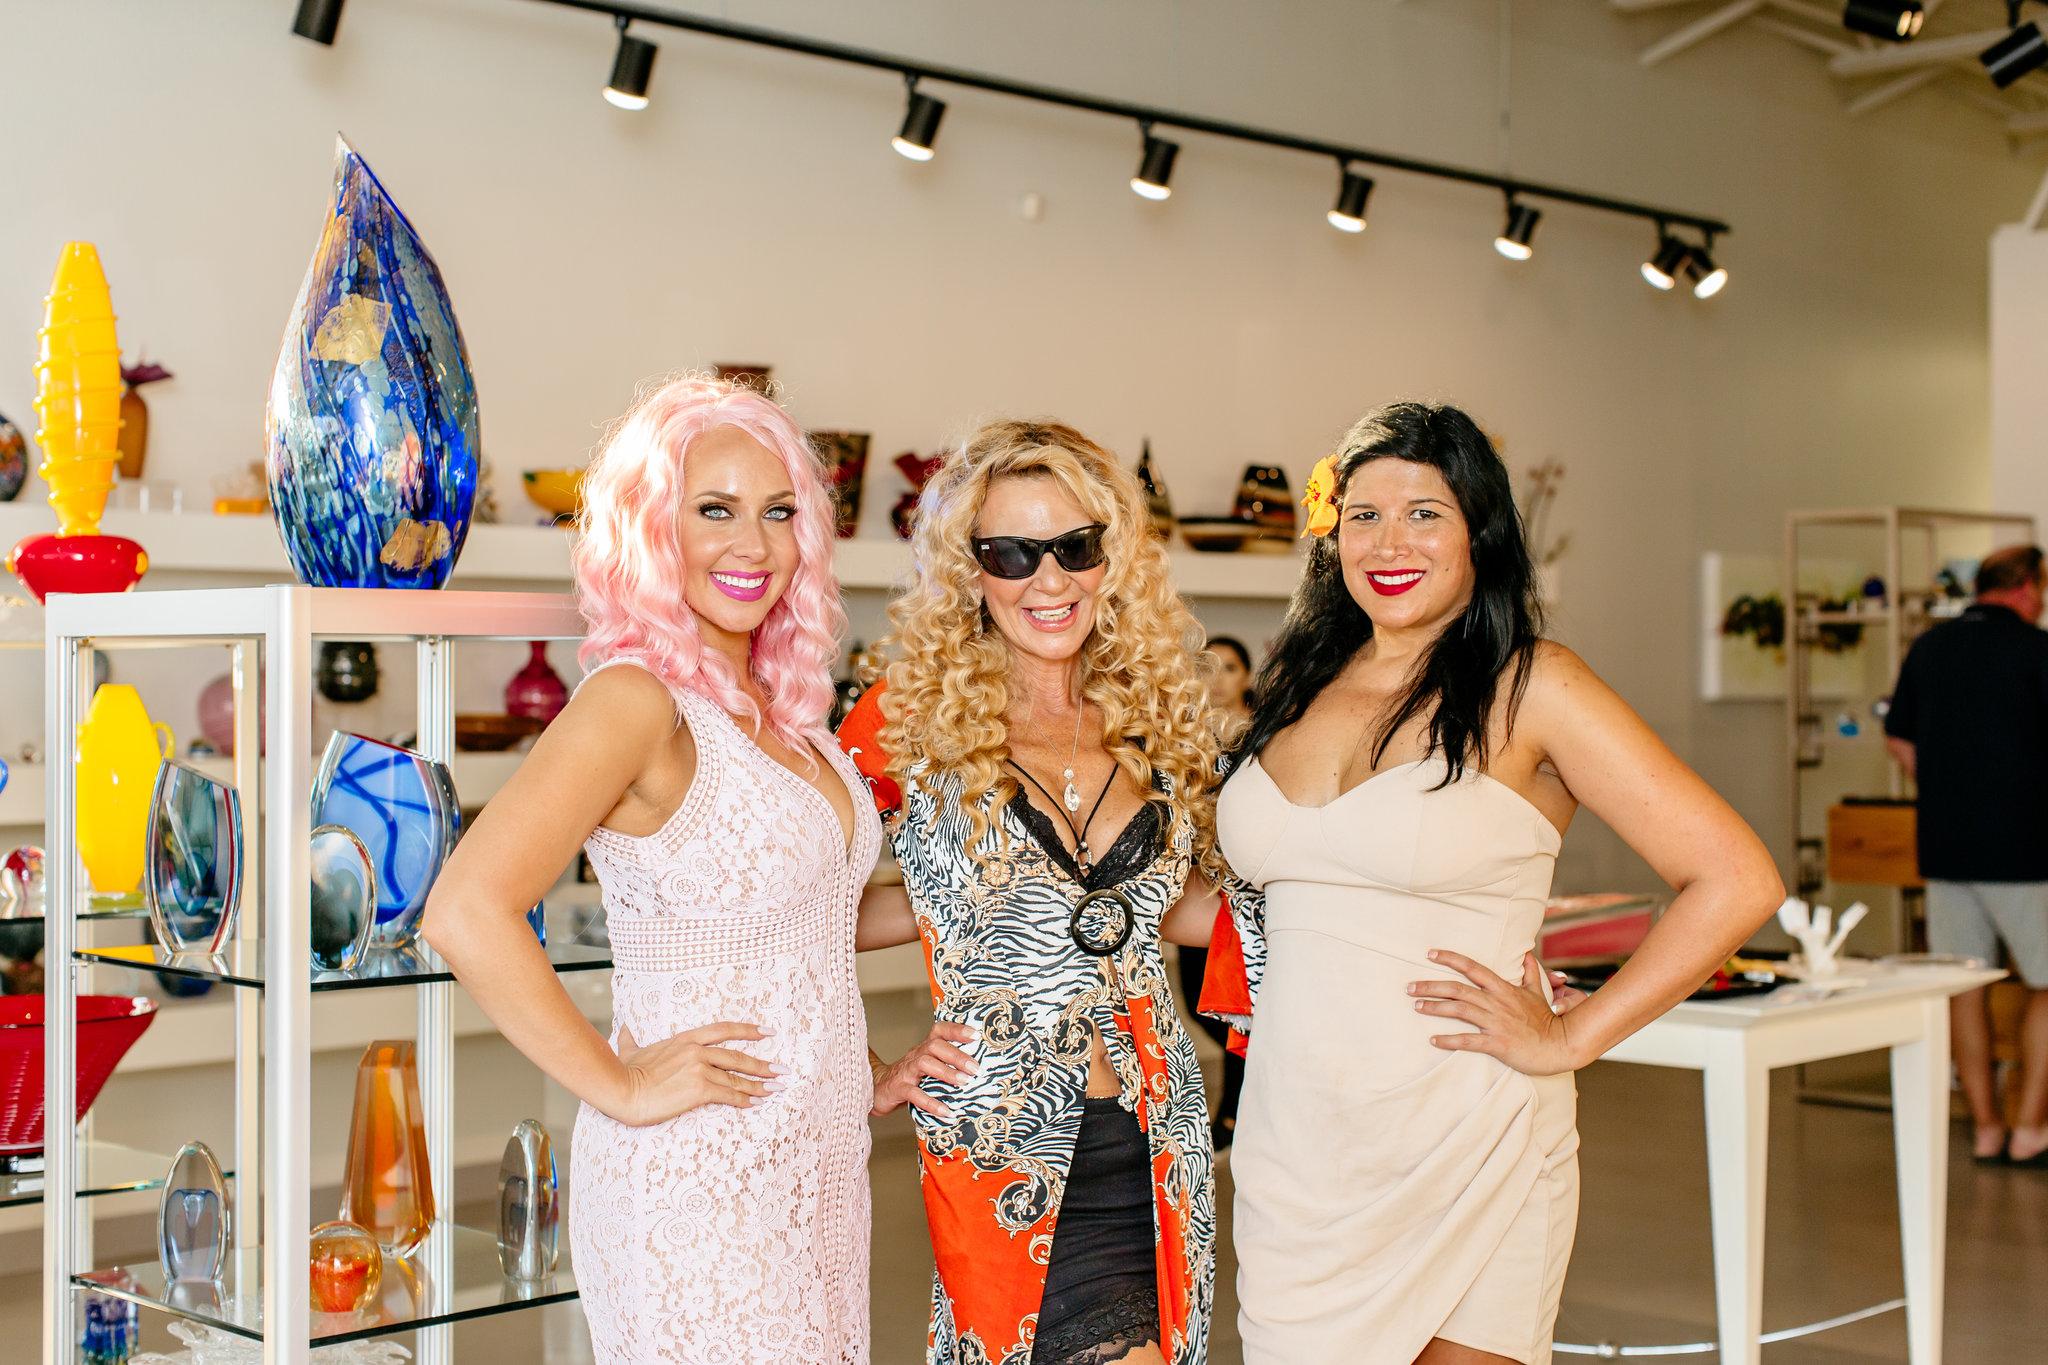 Alexa-Vossler-Photo_Dallas-Event-Photographer_Brite-Bar-Beauty-2018-Lipstick-Launch-Party-155.jpg